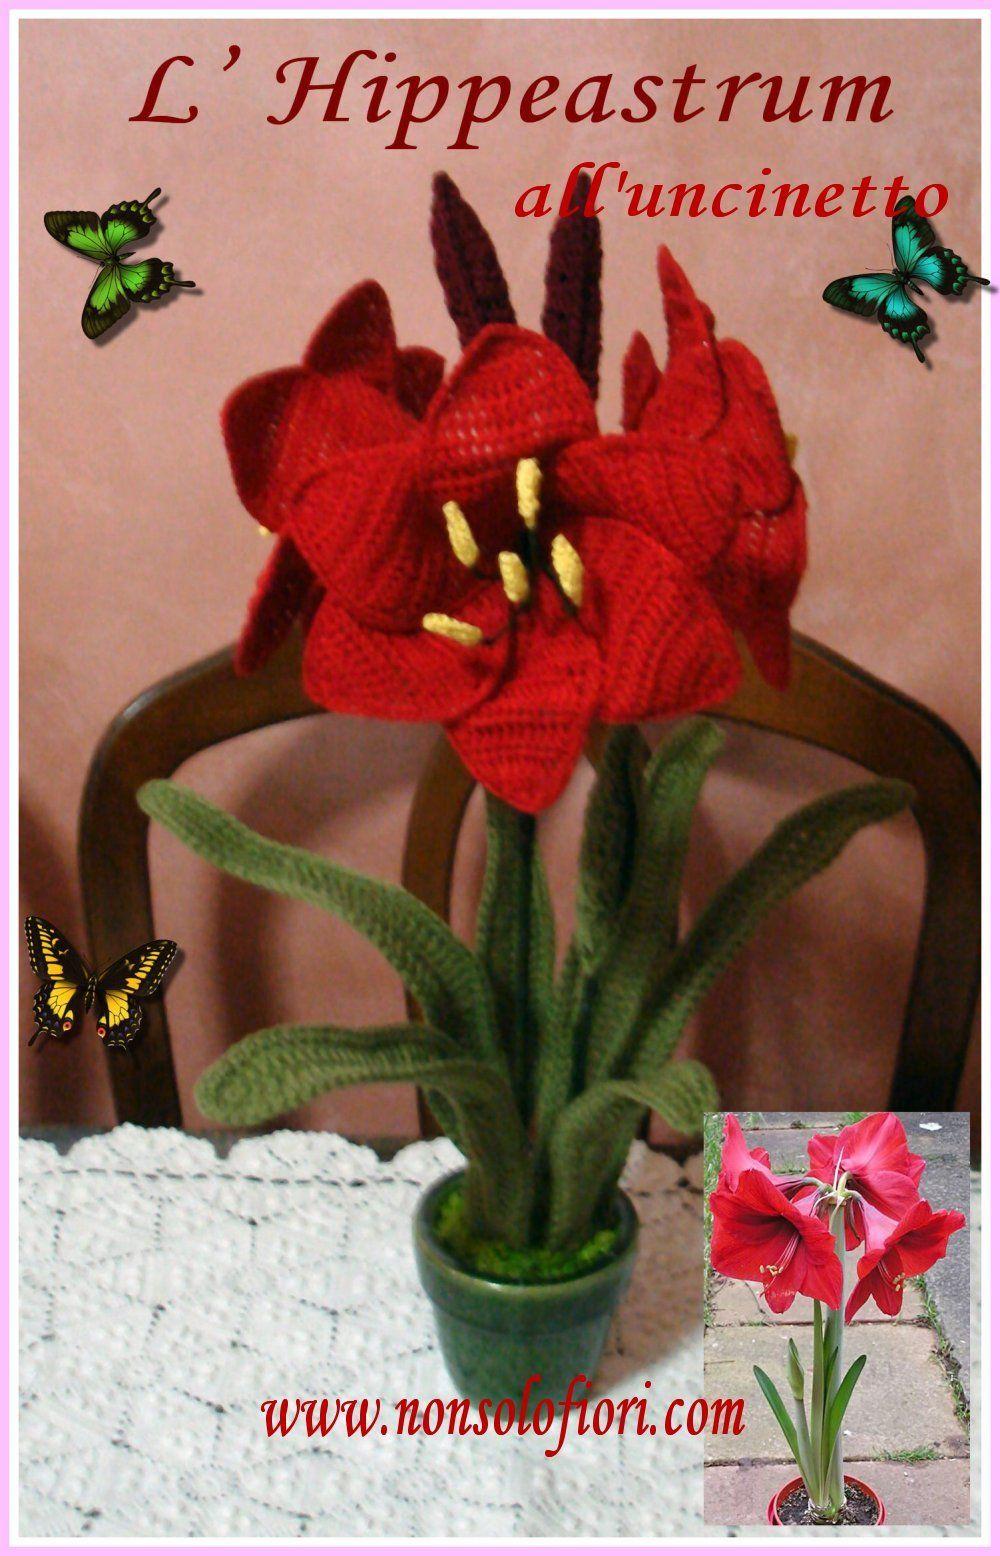 Lhippeastrum Alluncinetto Nonsolofioricom Flores Y Plantas Rose Crochet Crochetflowers Pretty Flower Diagram Crocheted Flowersflower